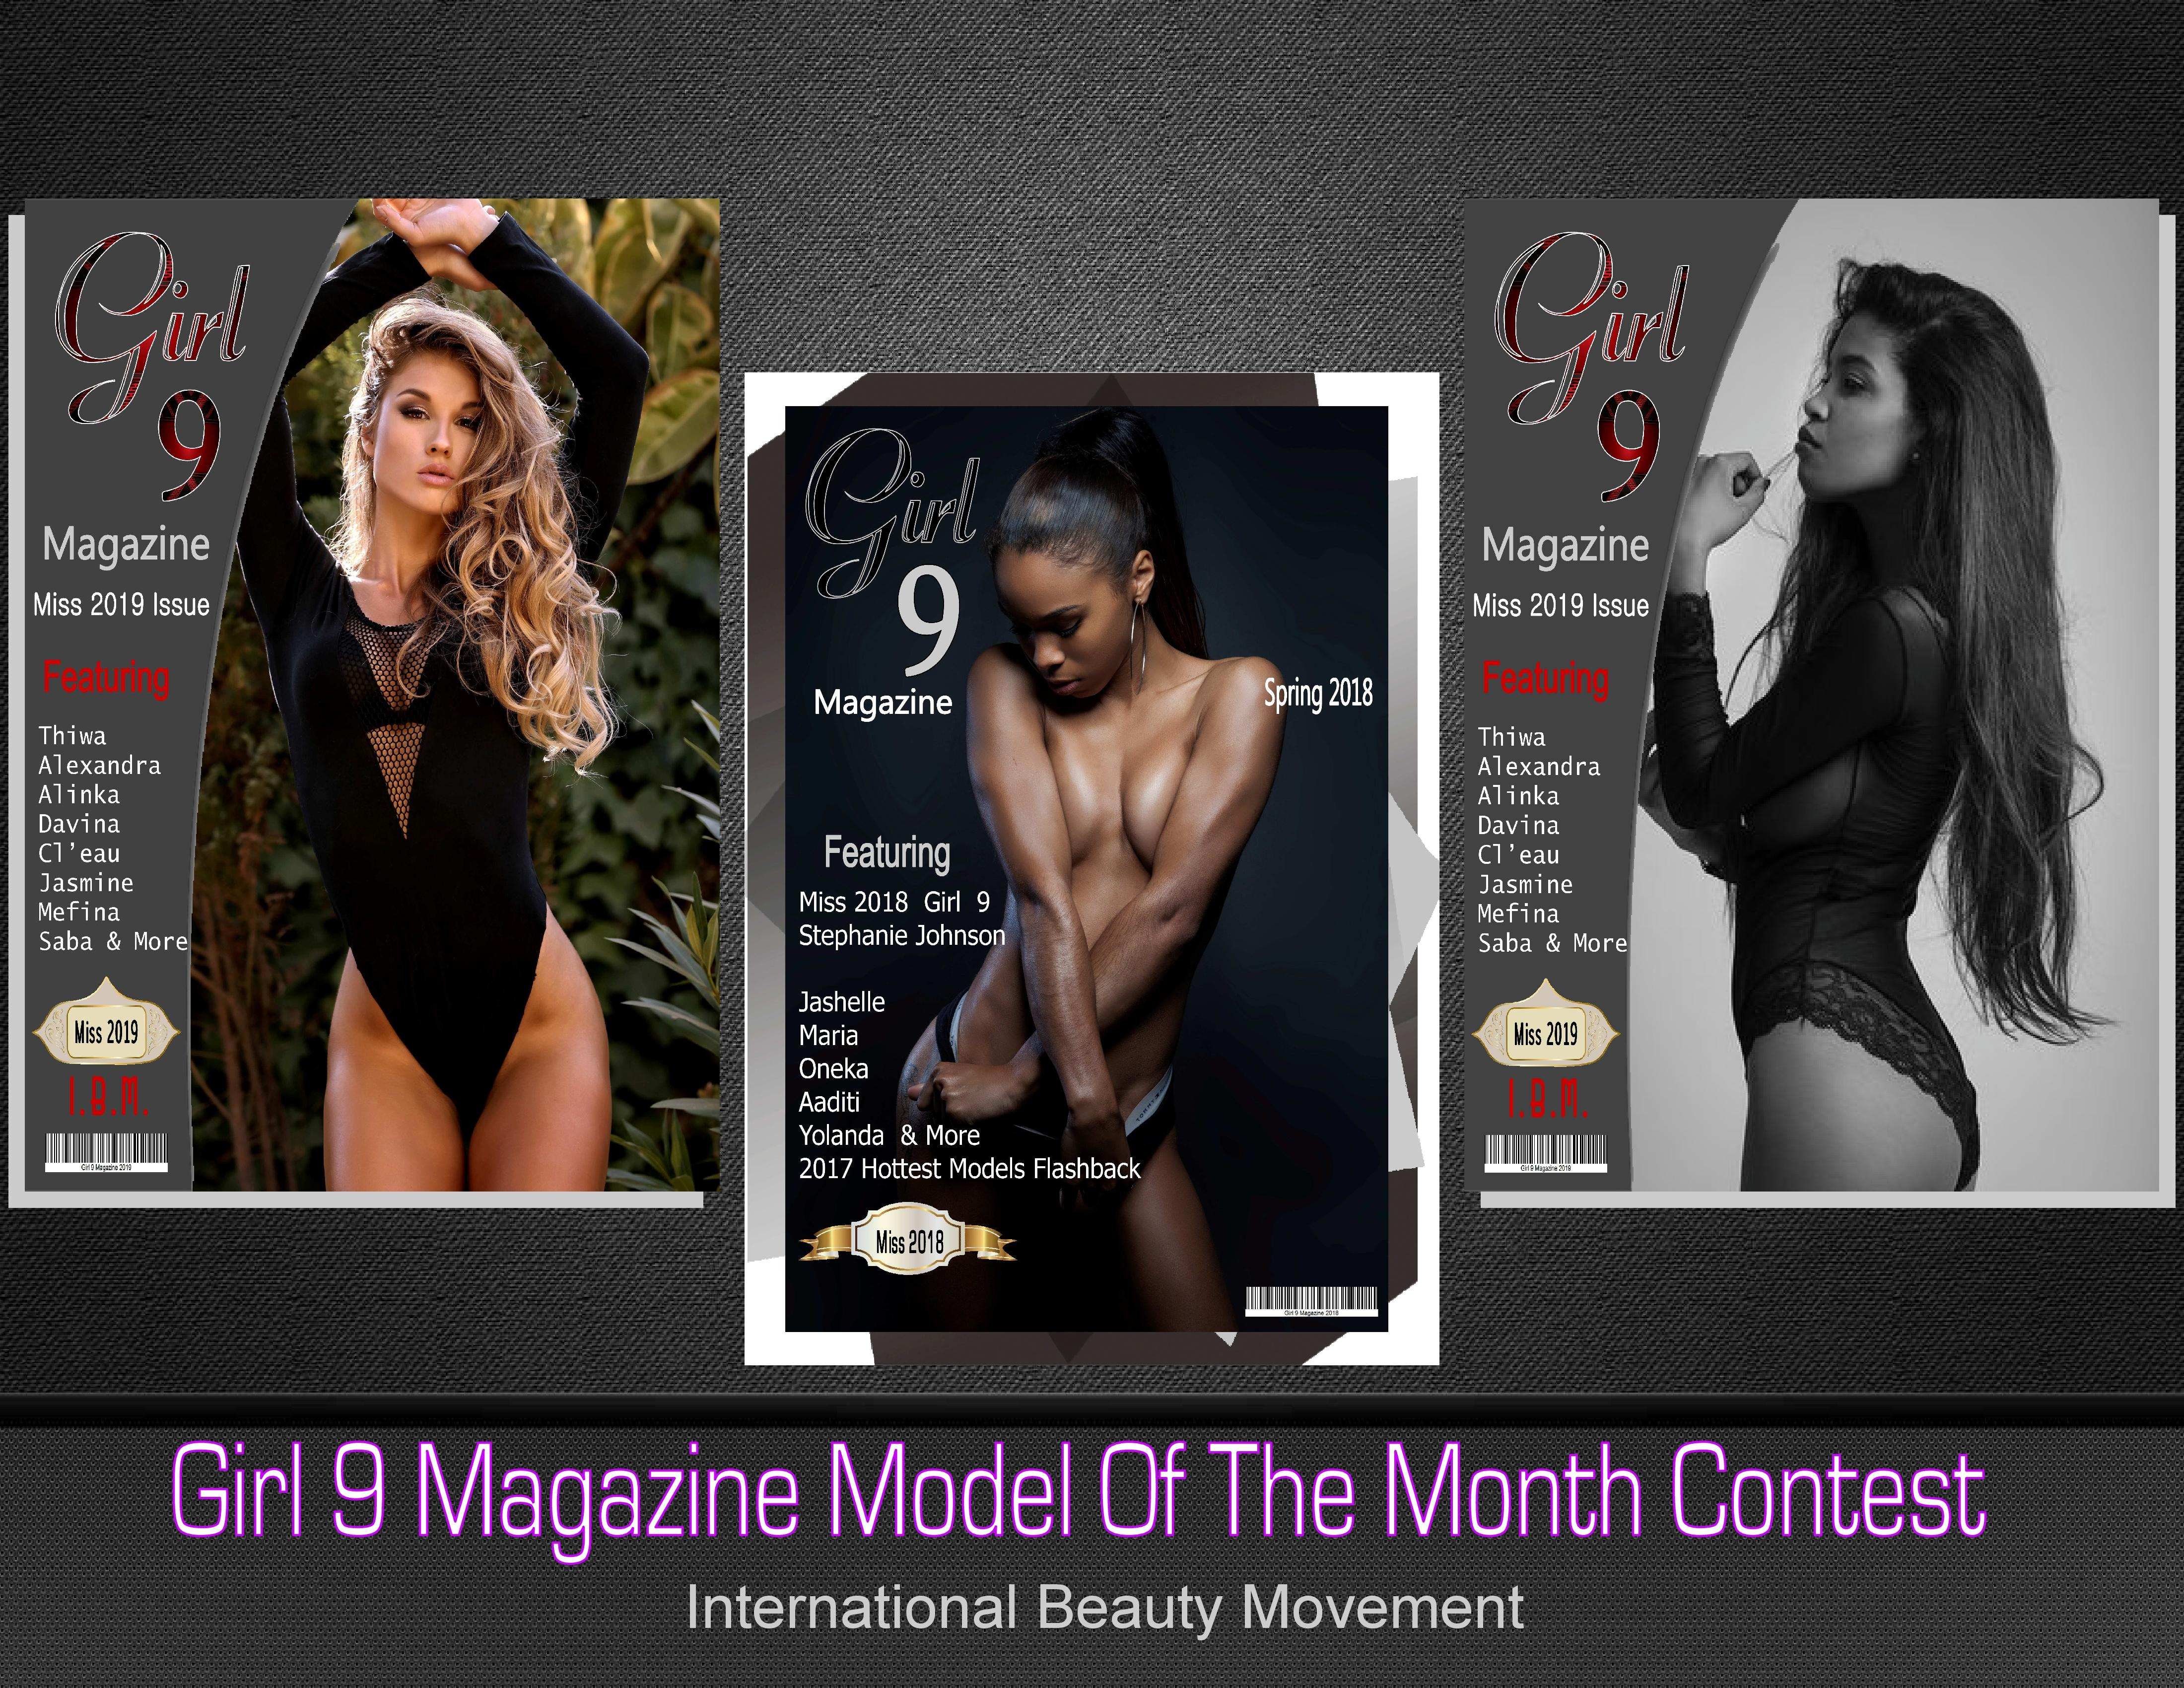 2021 Girl 9 Magazine Model of the Year Modeling Casting Calls